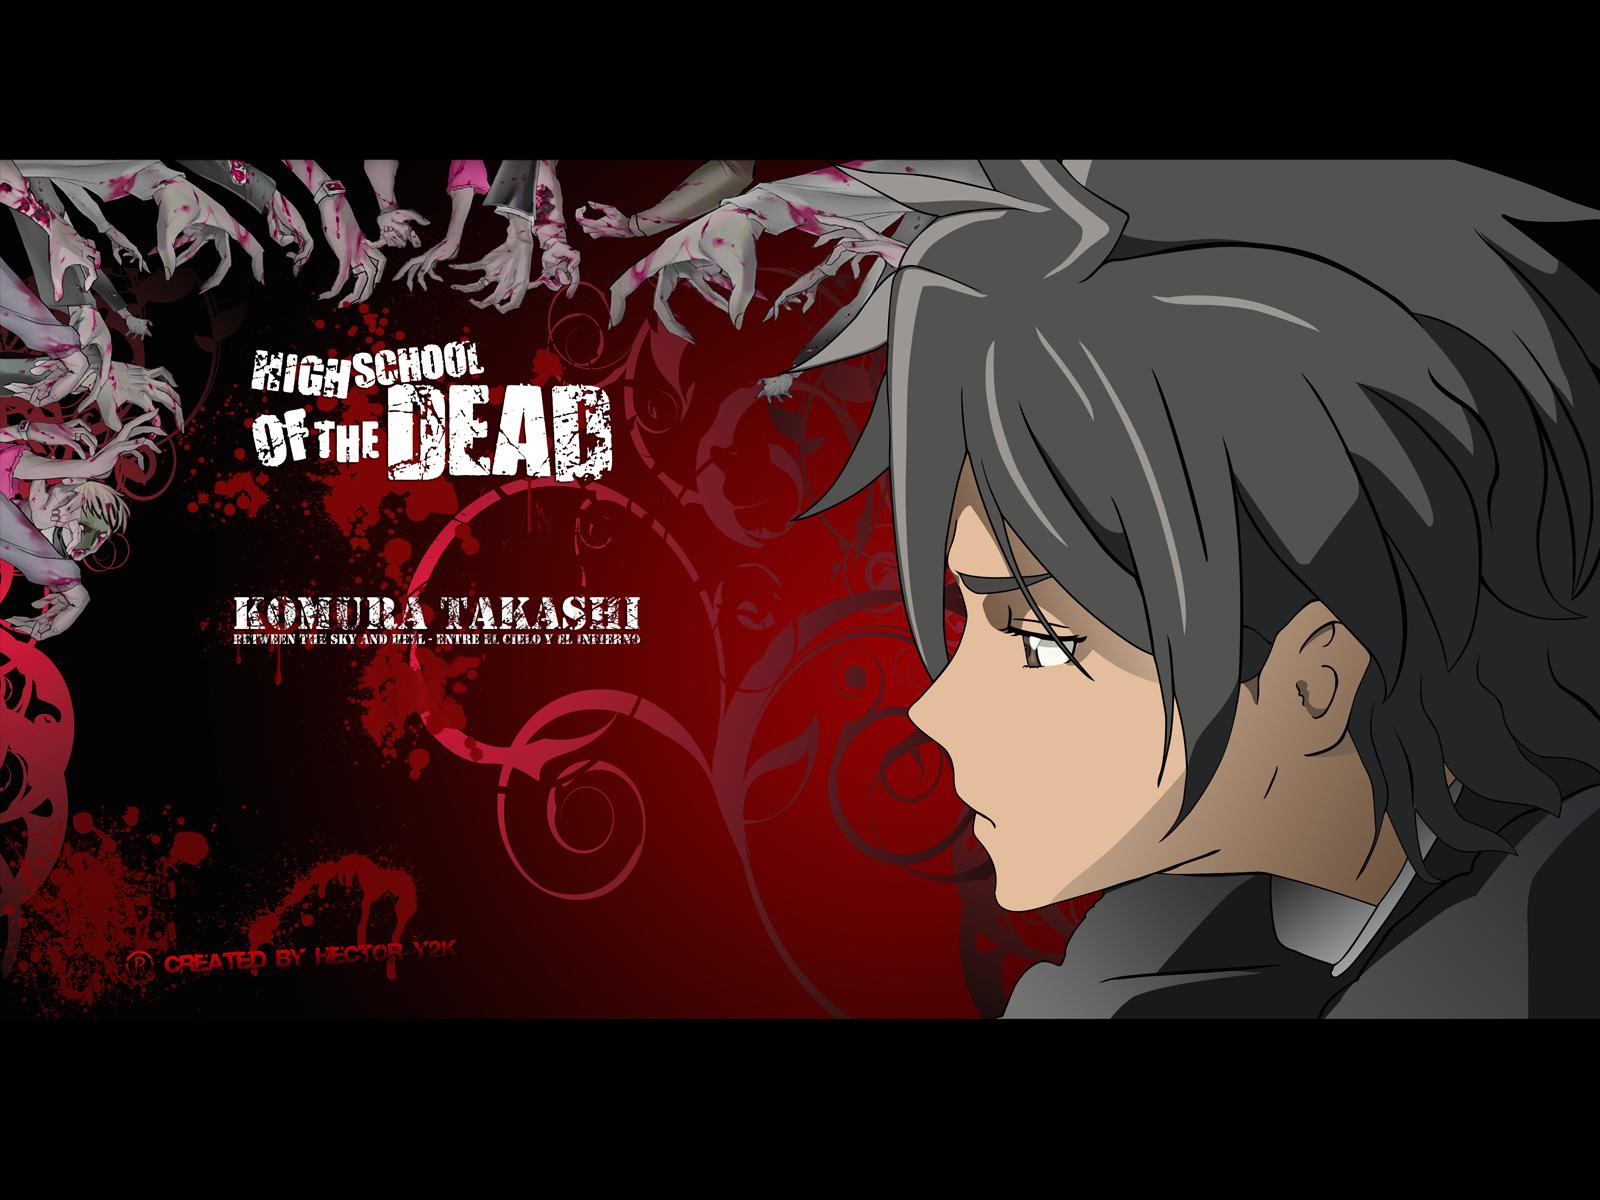 Школа мертвецов аниме обои и картинки